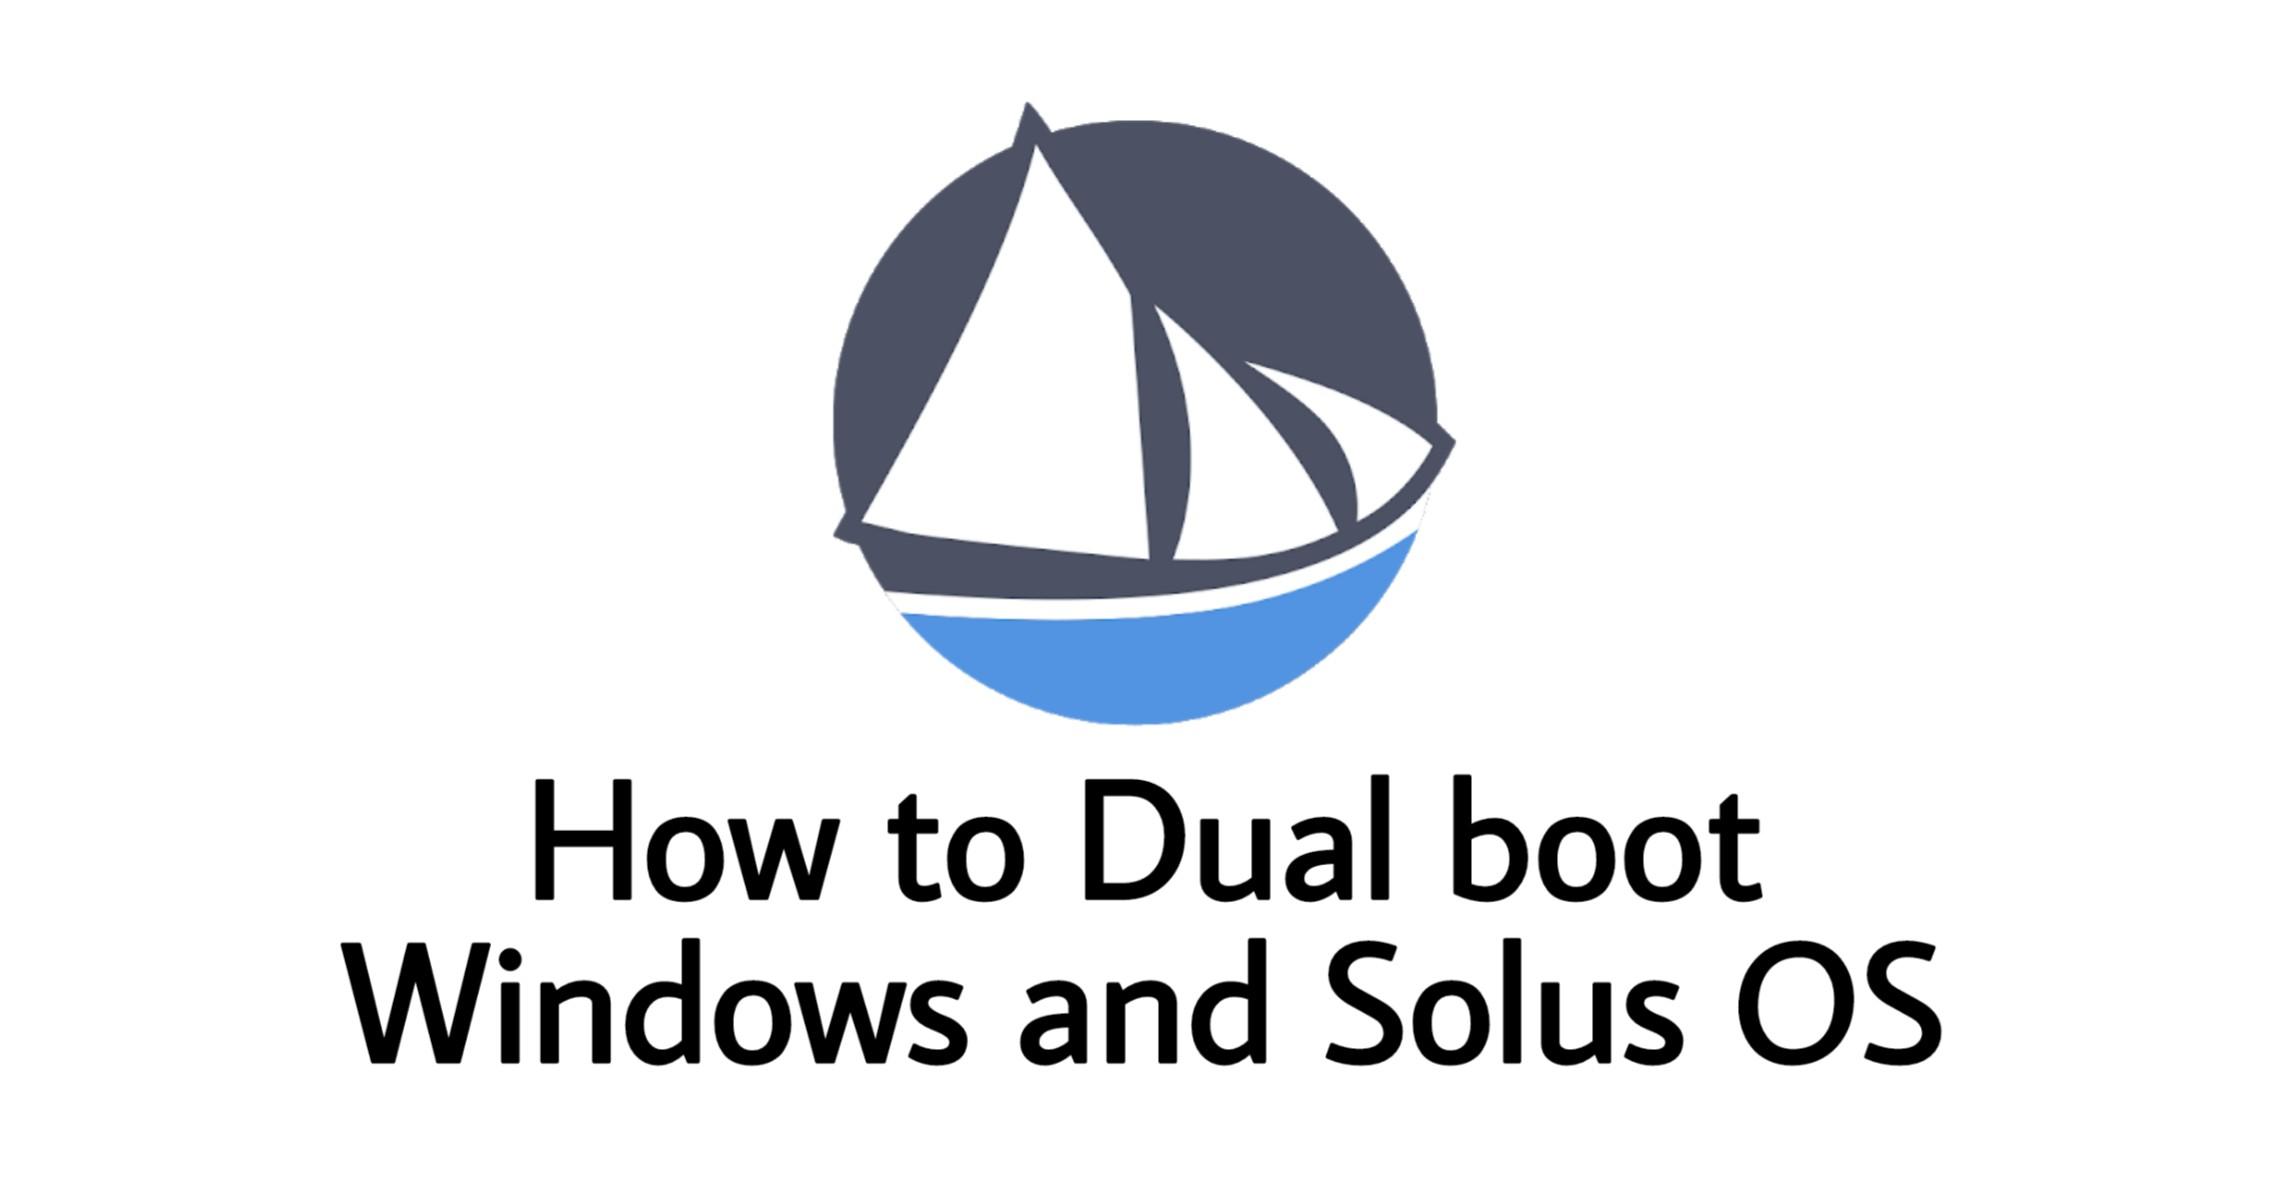 Install Solus OS alongside Windwos